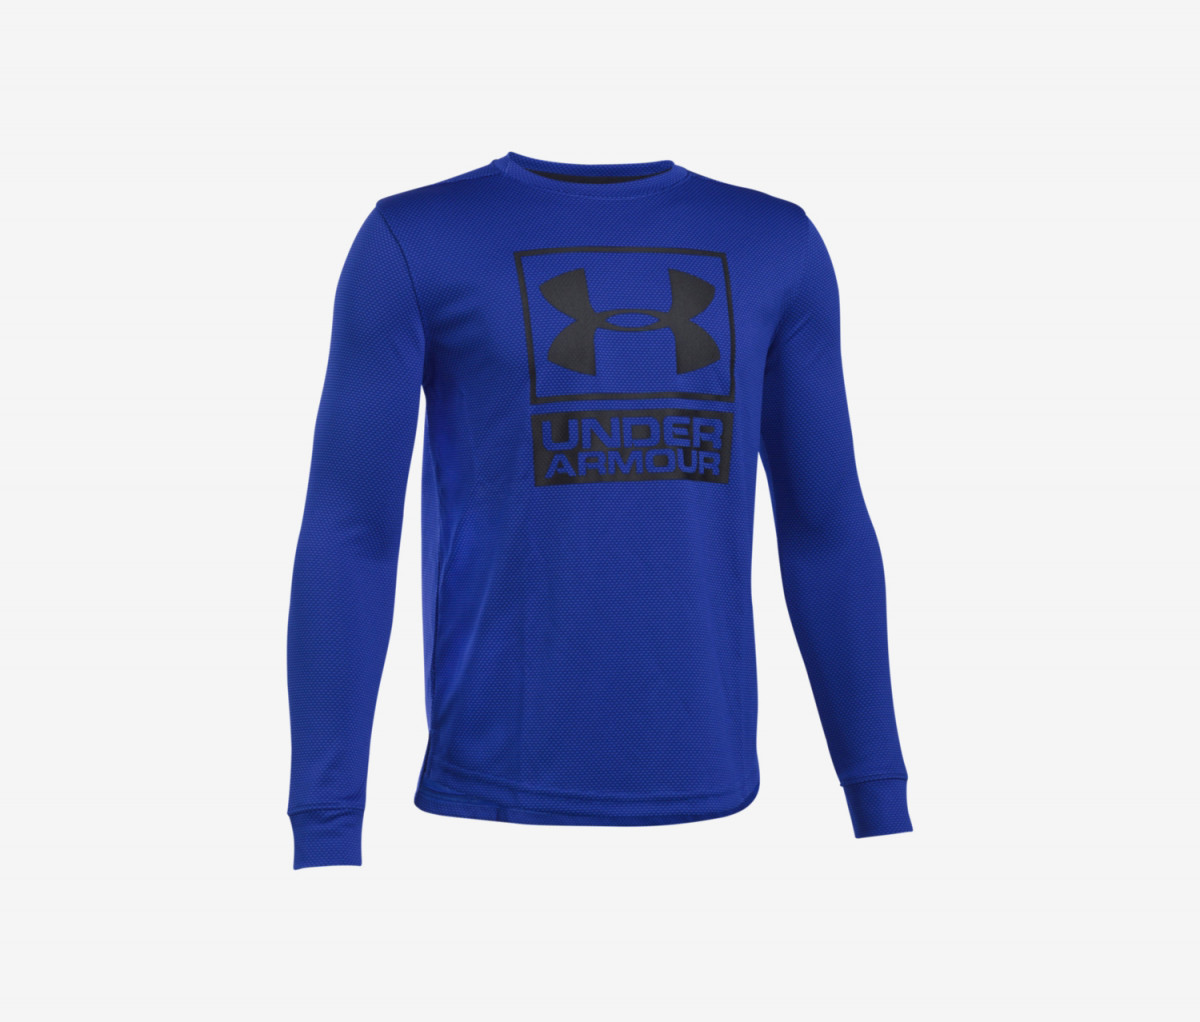 Under Armour Boys Textured Tech Crew Shirt  Blue/Black